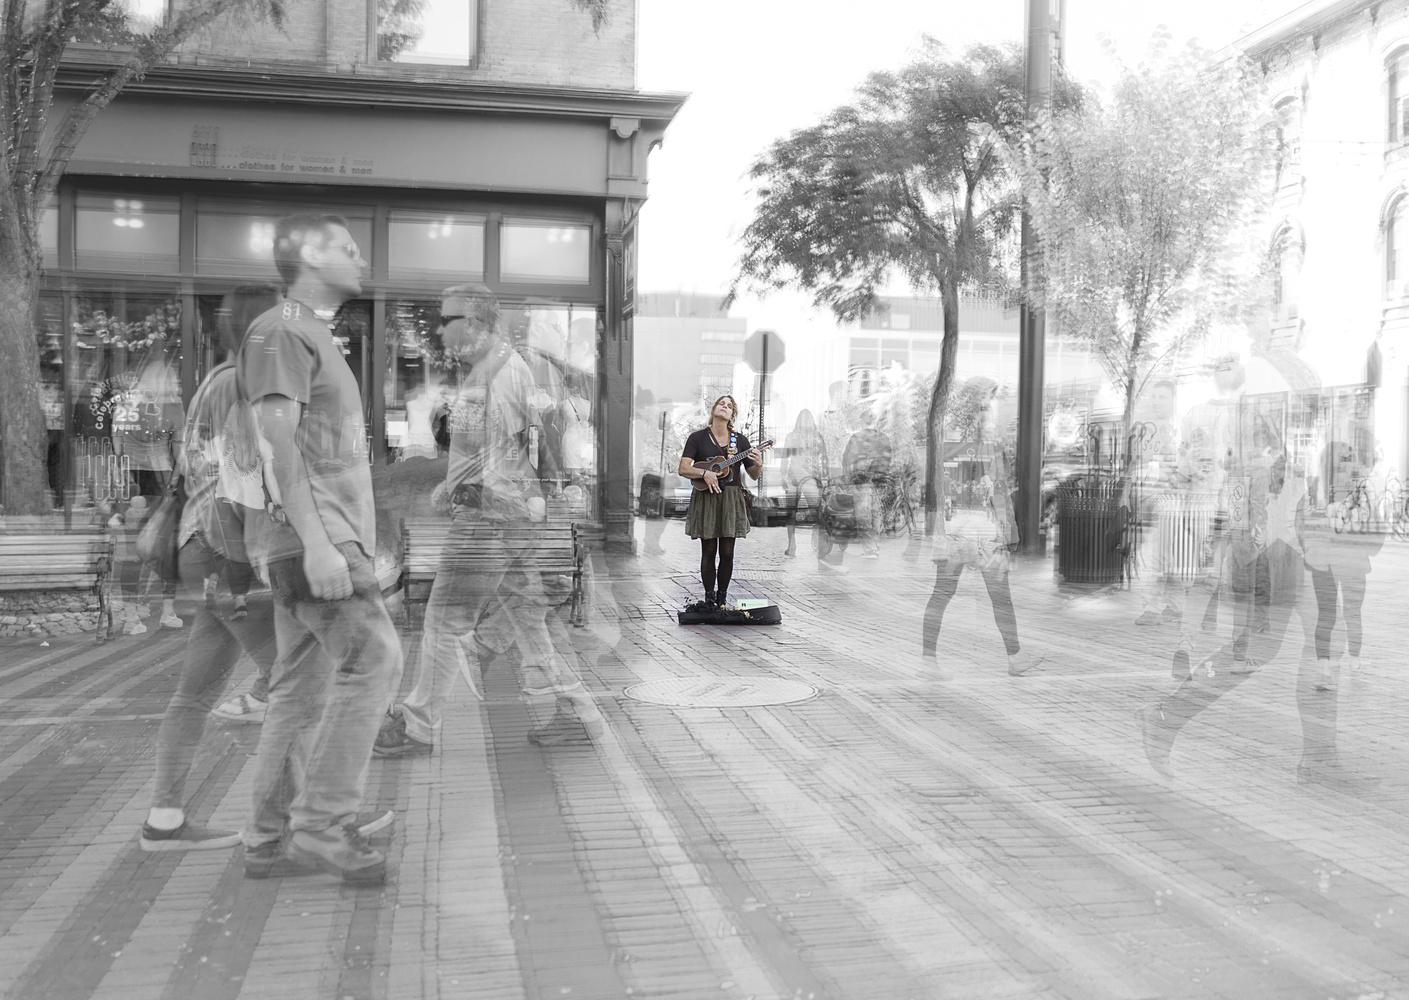 Street performer Burlington VT by Janna Broski